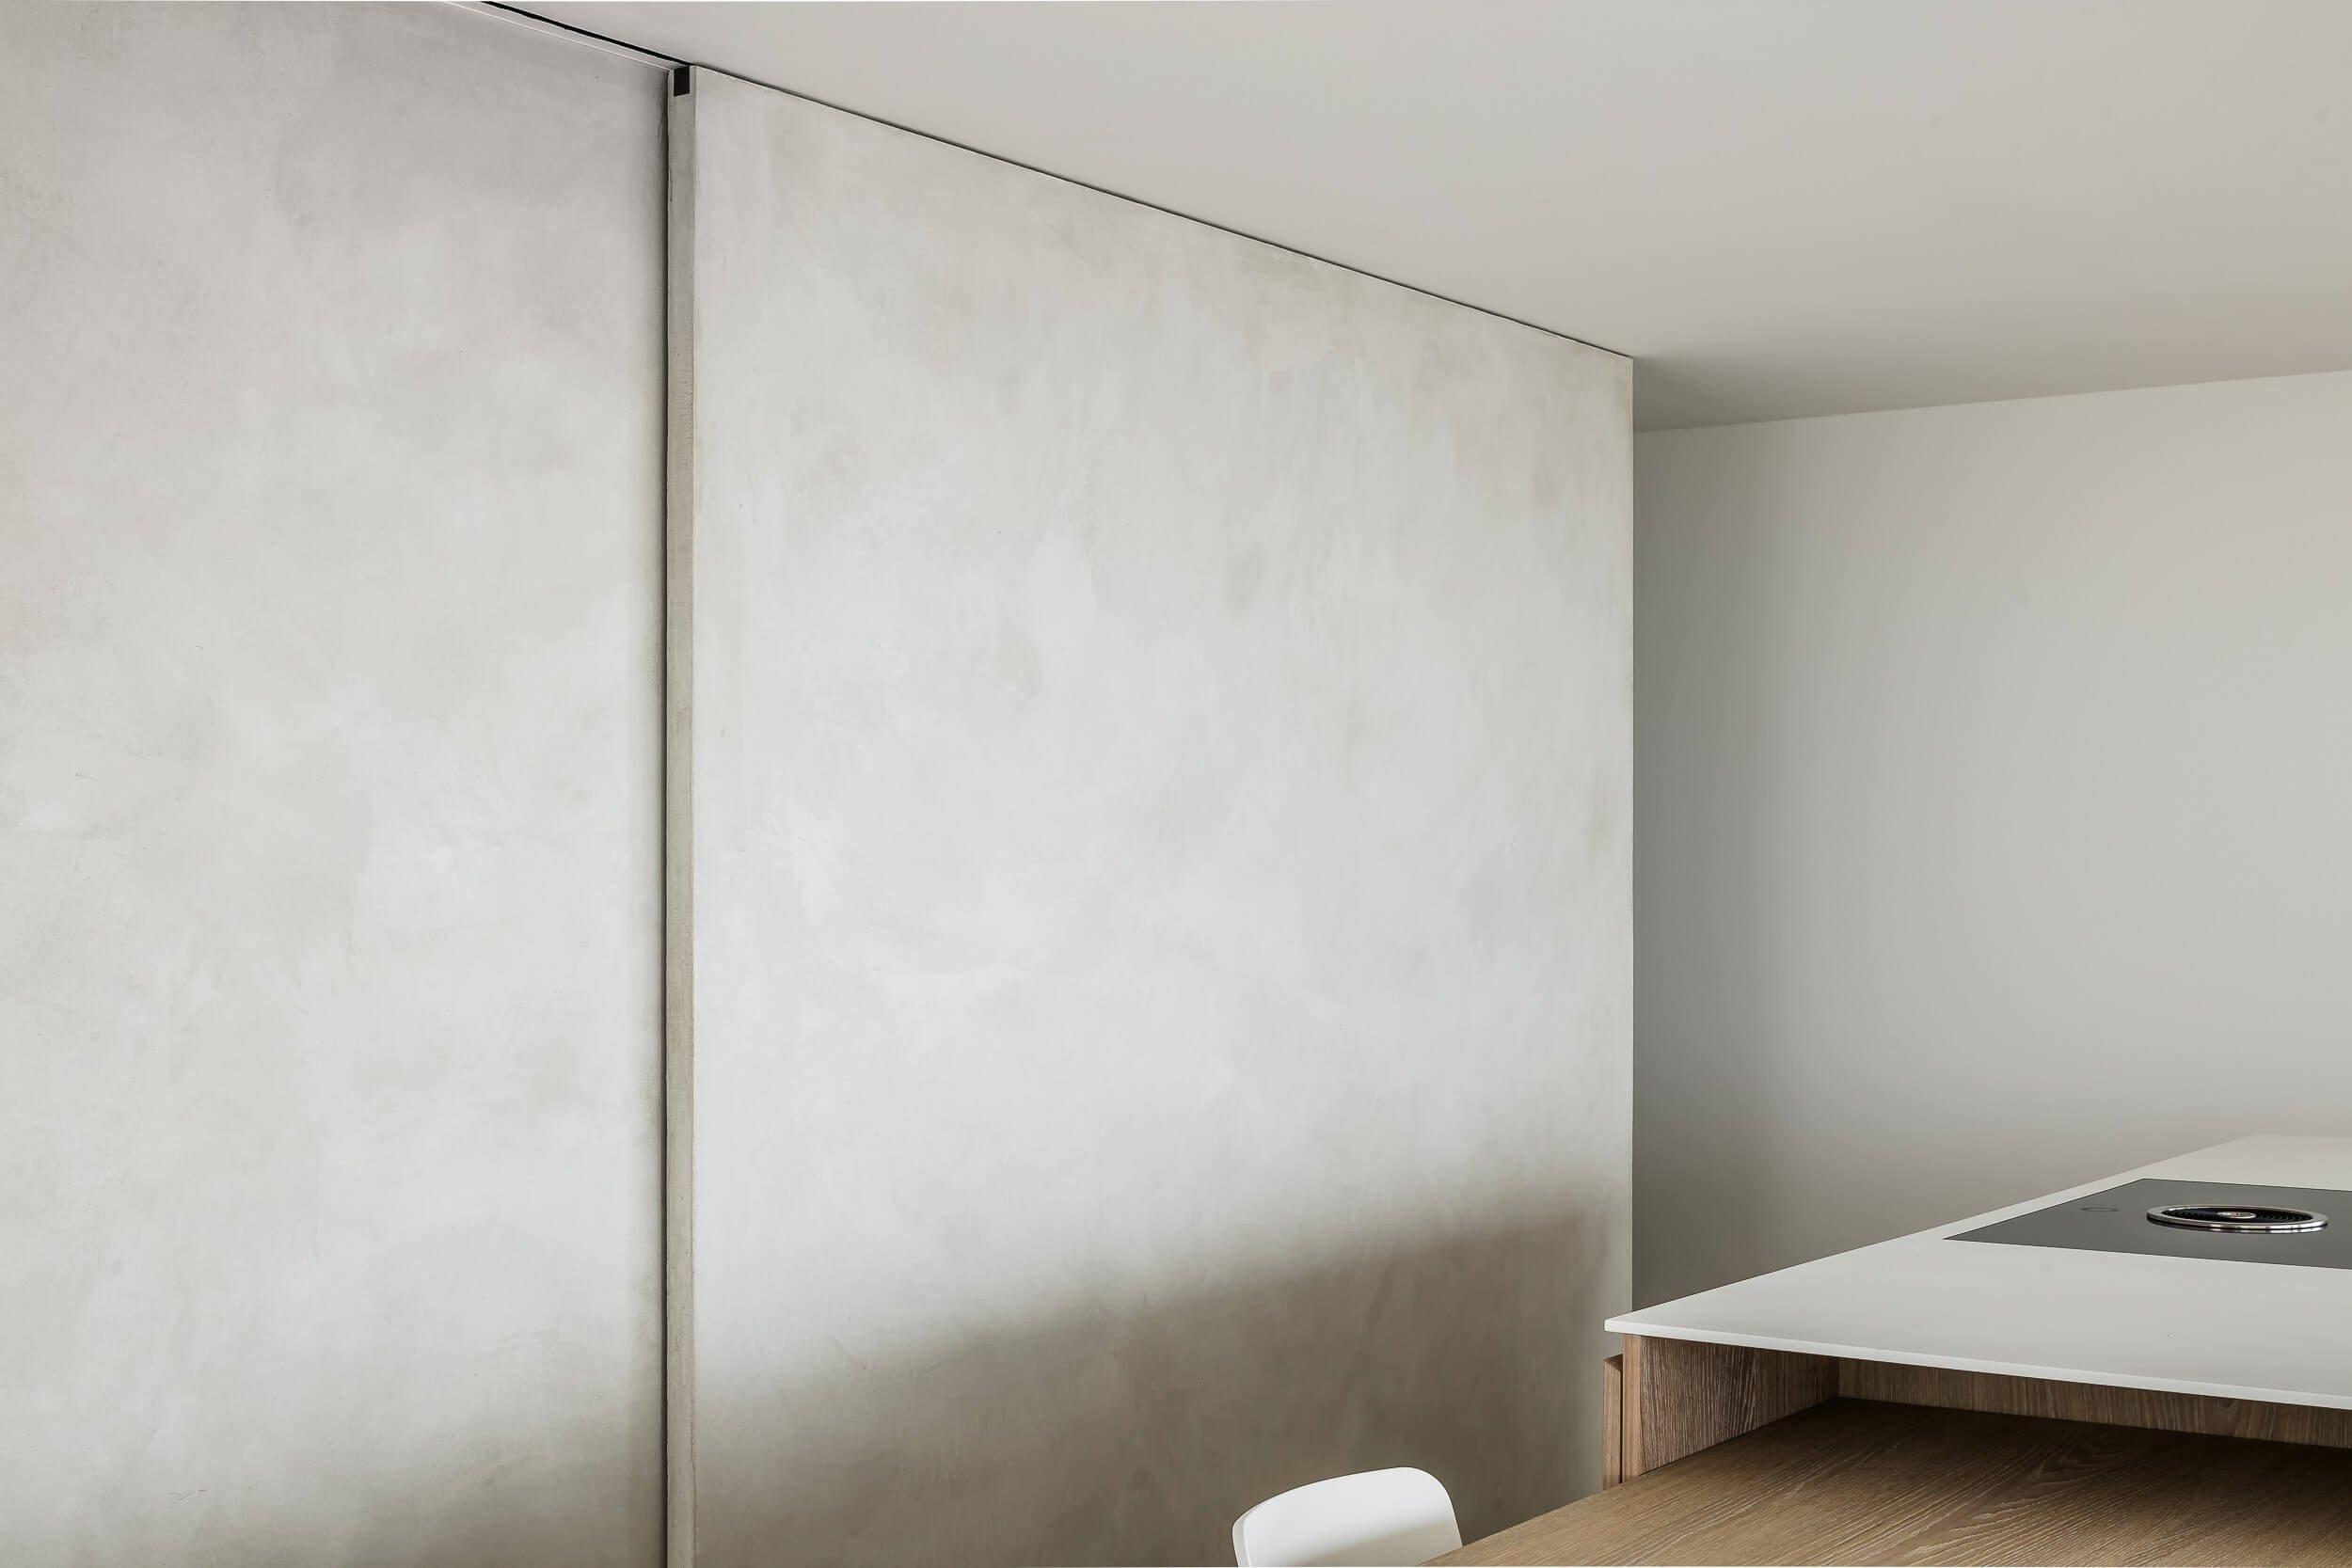 Rietveldprojects.be-five-am-rrr-odilon-creations-photobycafeine14